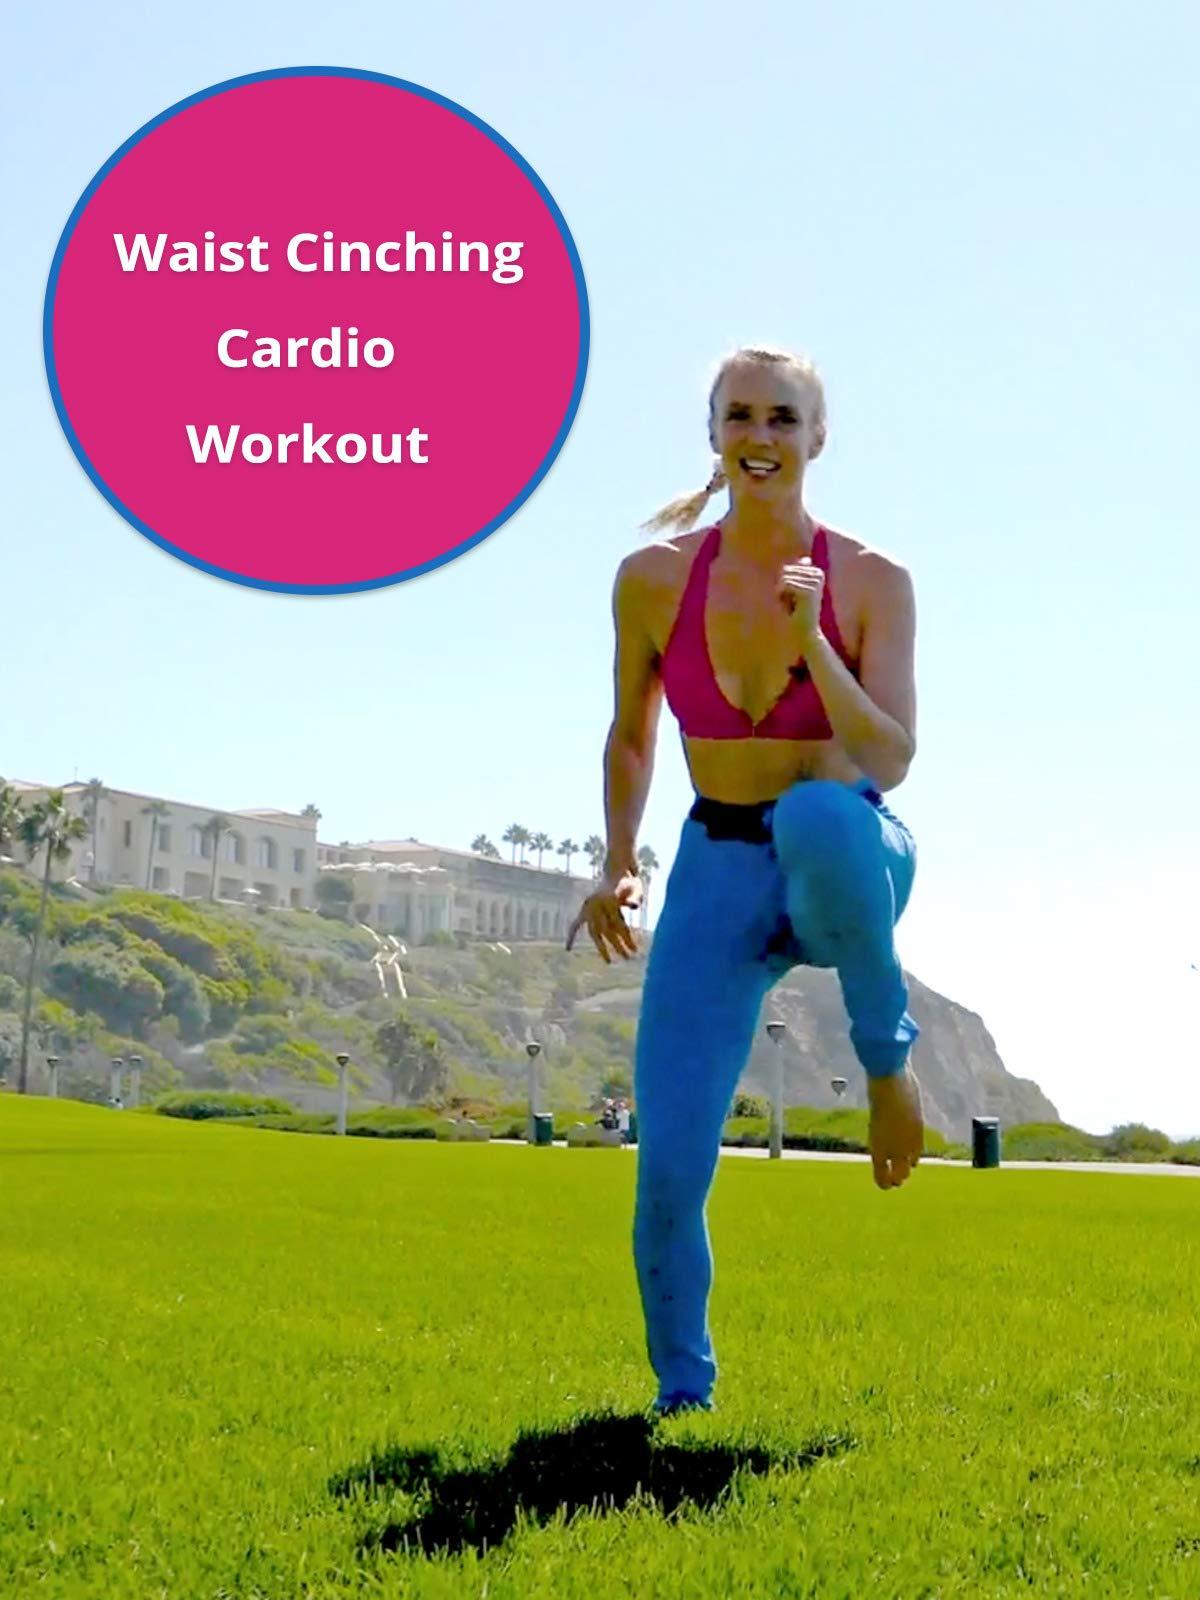 Waist Cinching Cardio Workout